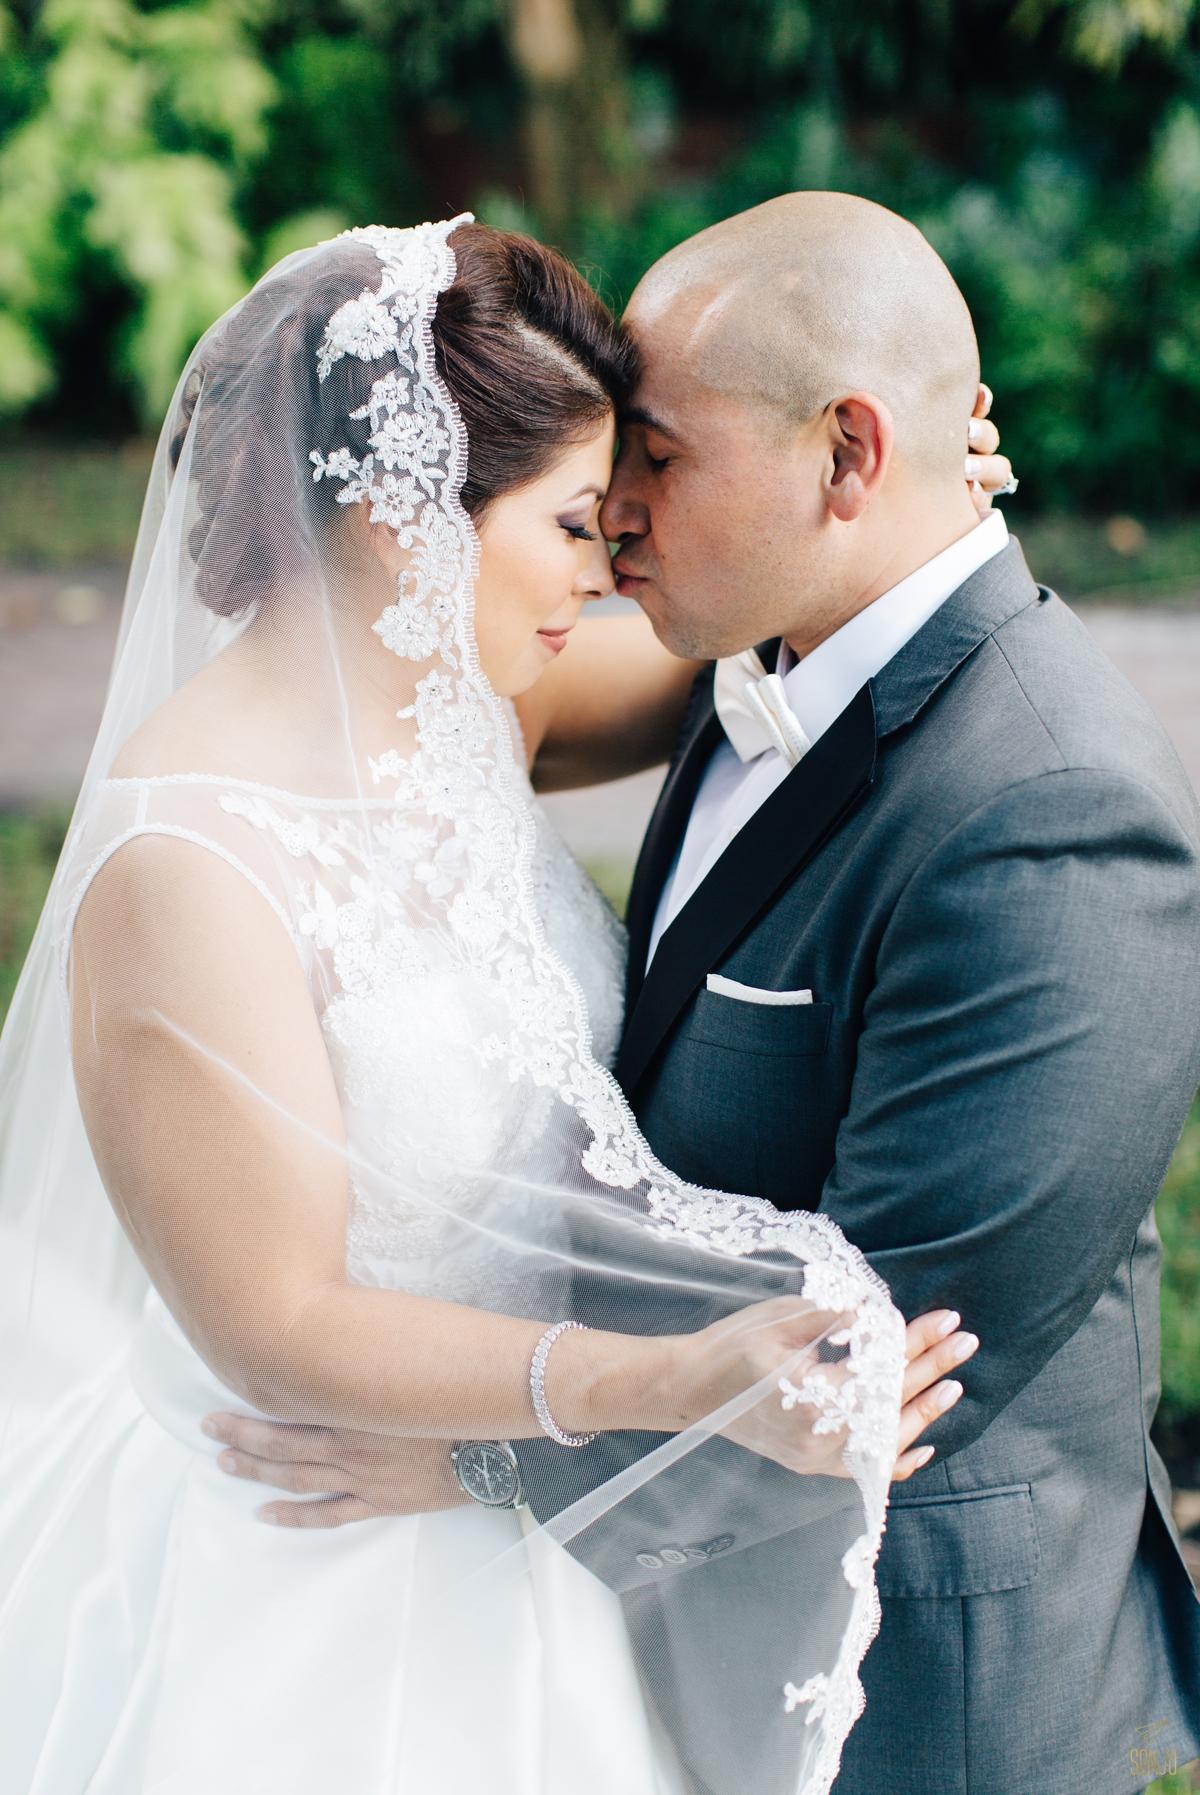 Jacaranda-Country-club-wedding-photographer-florida-venue-sonju-diana-marcos38.jpg